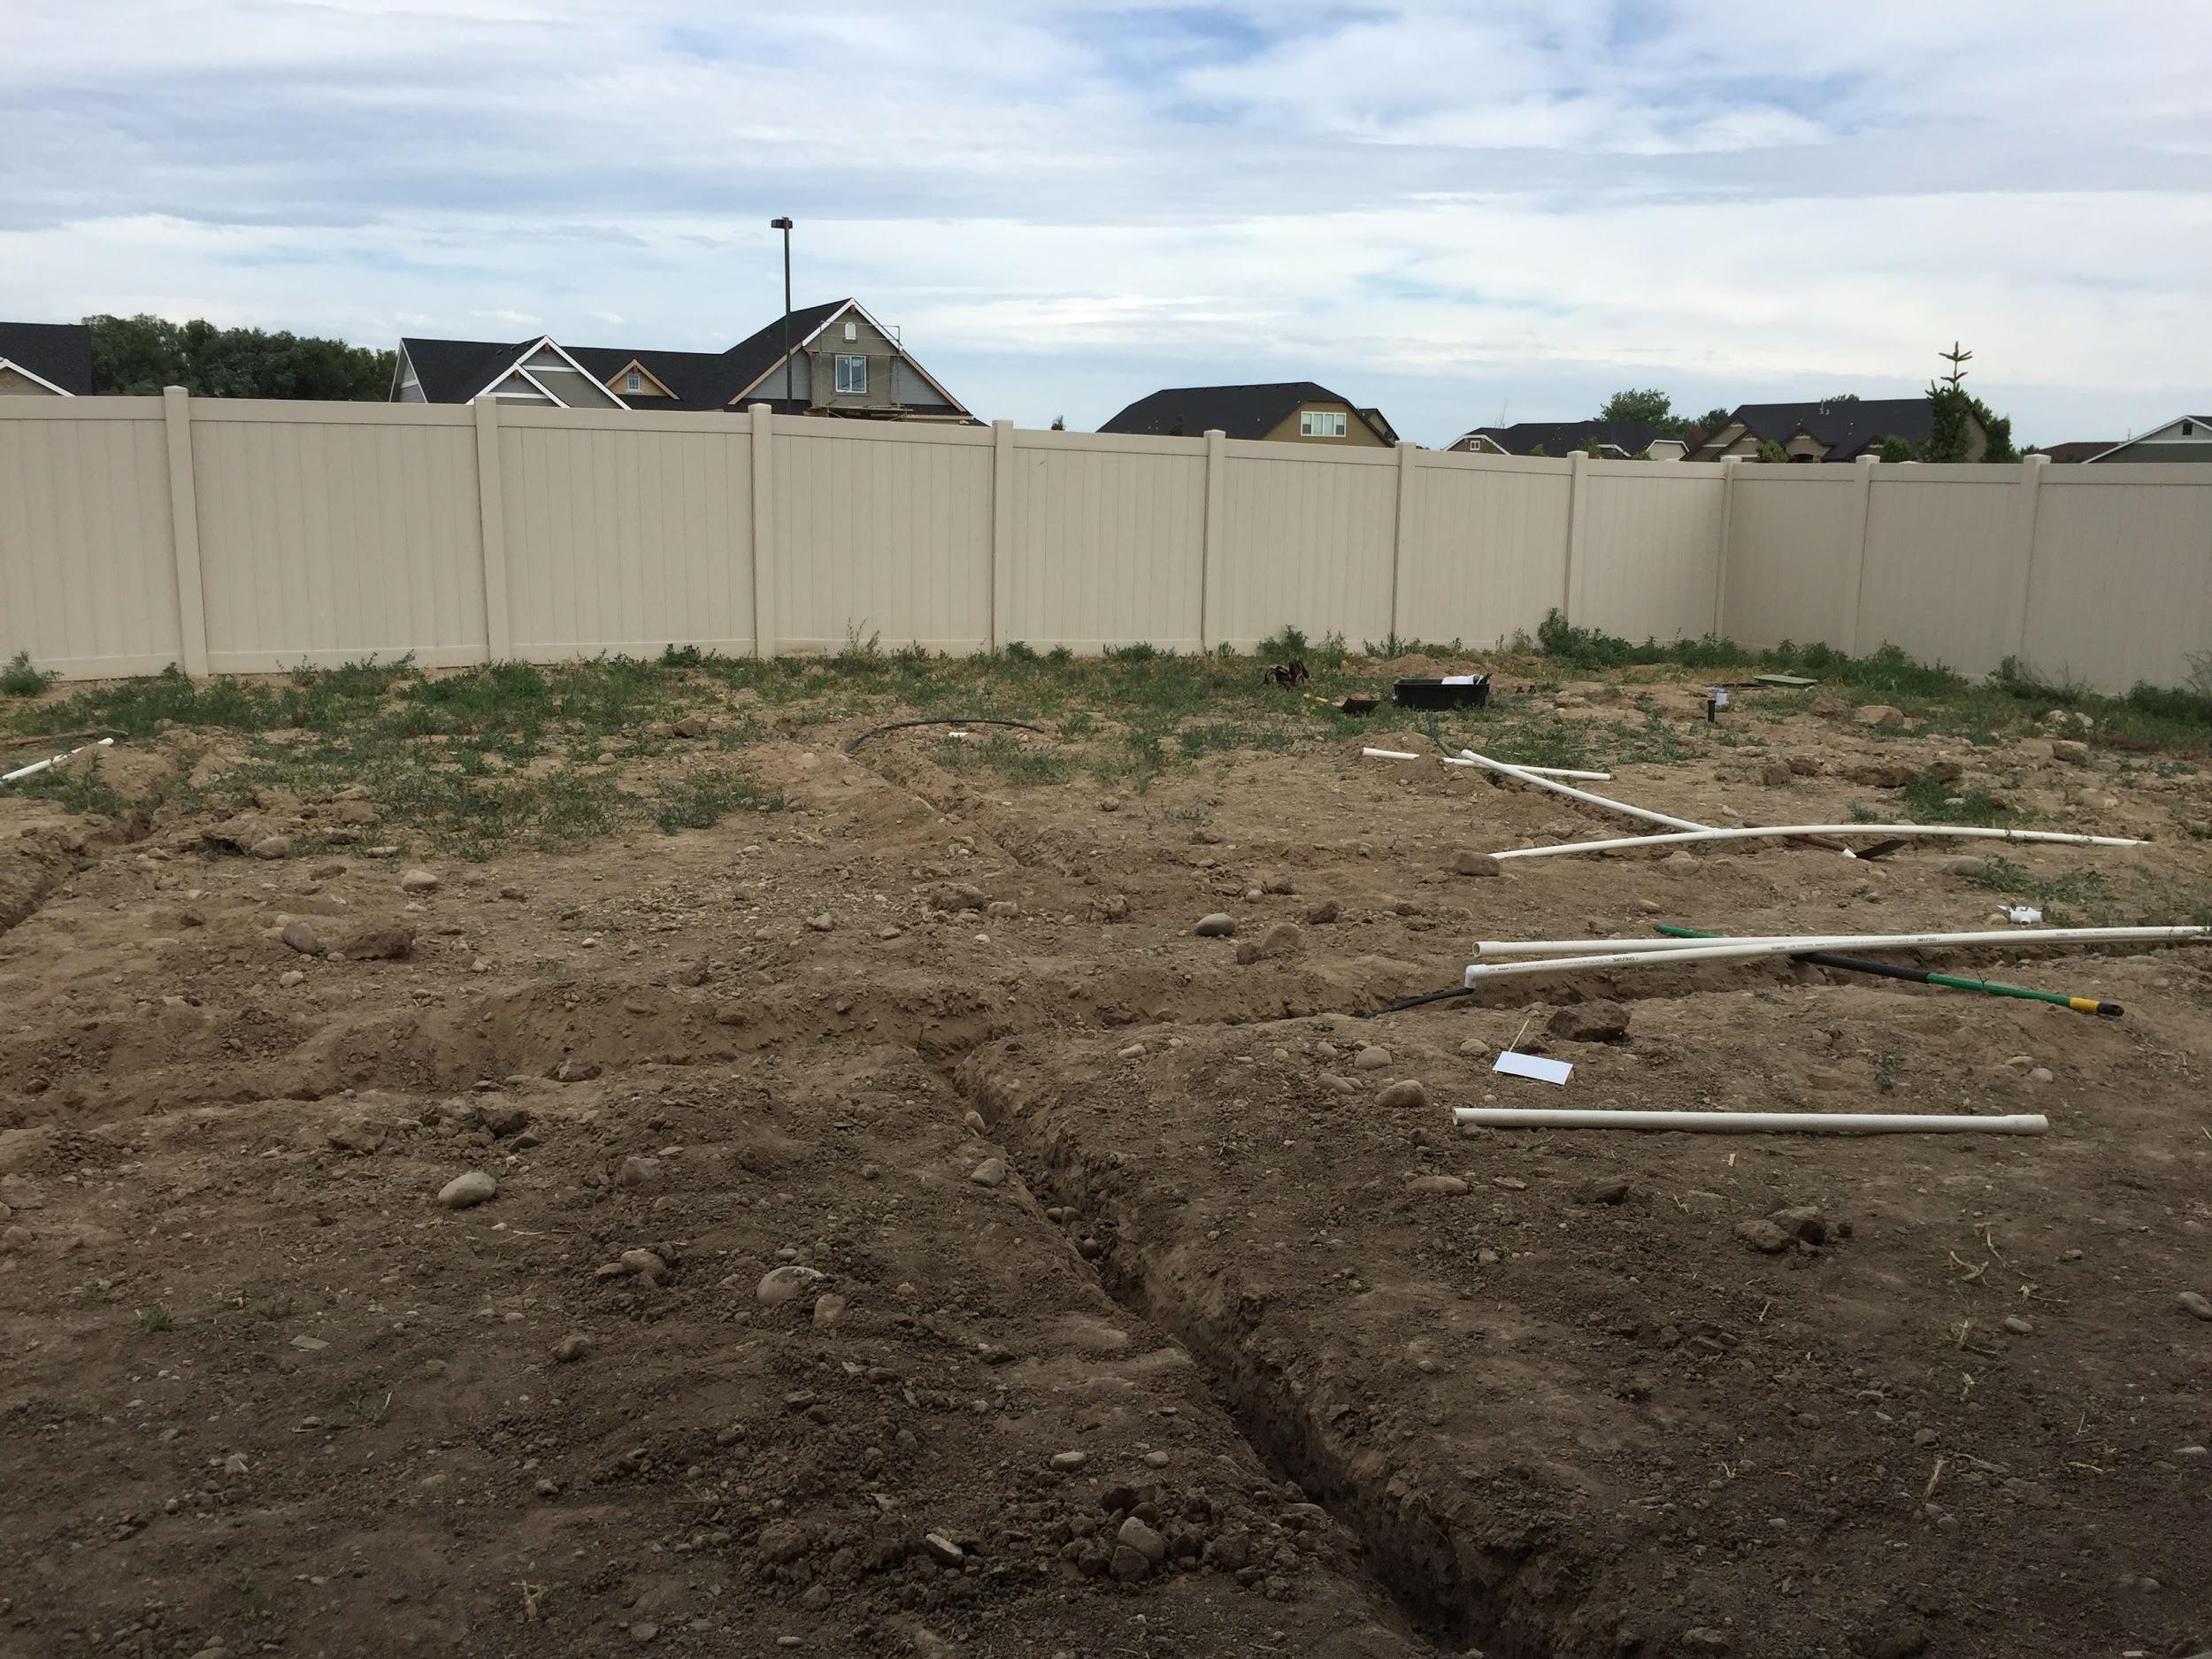 Preparing backyard to install DIY sprinkler system